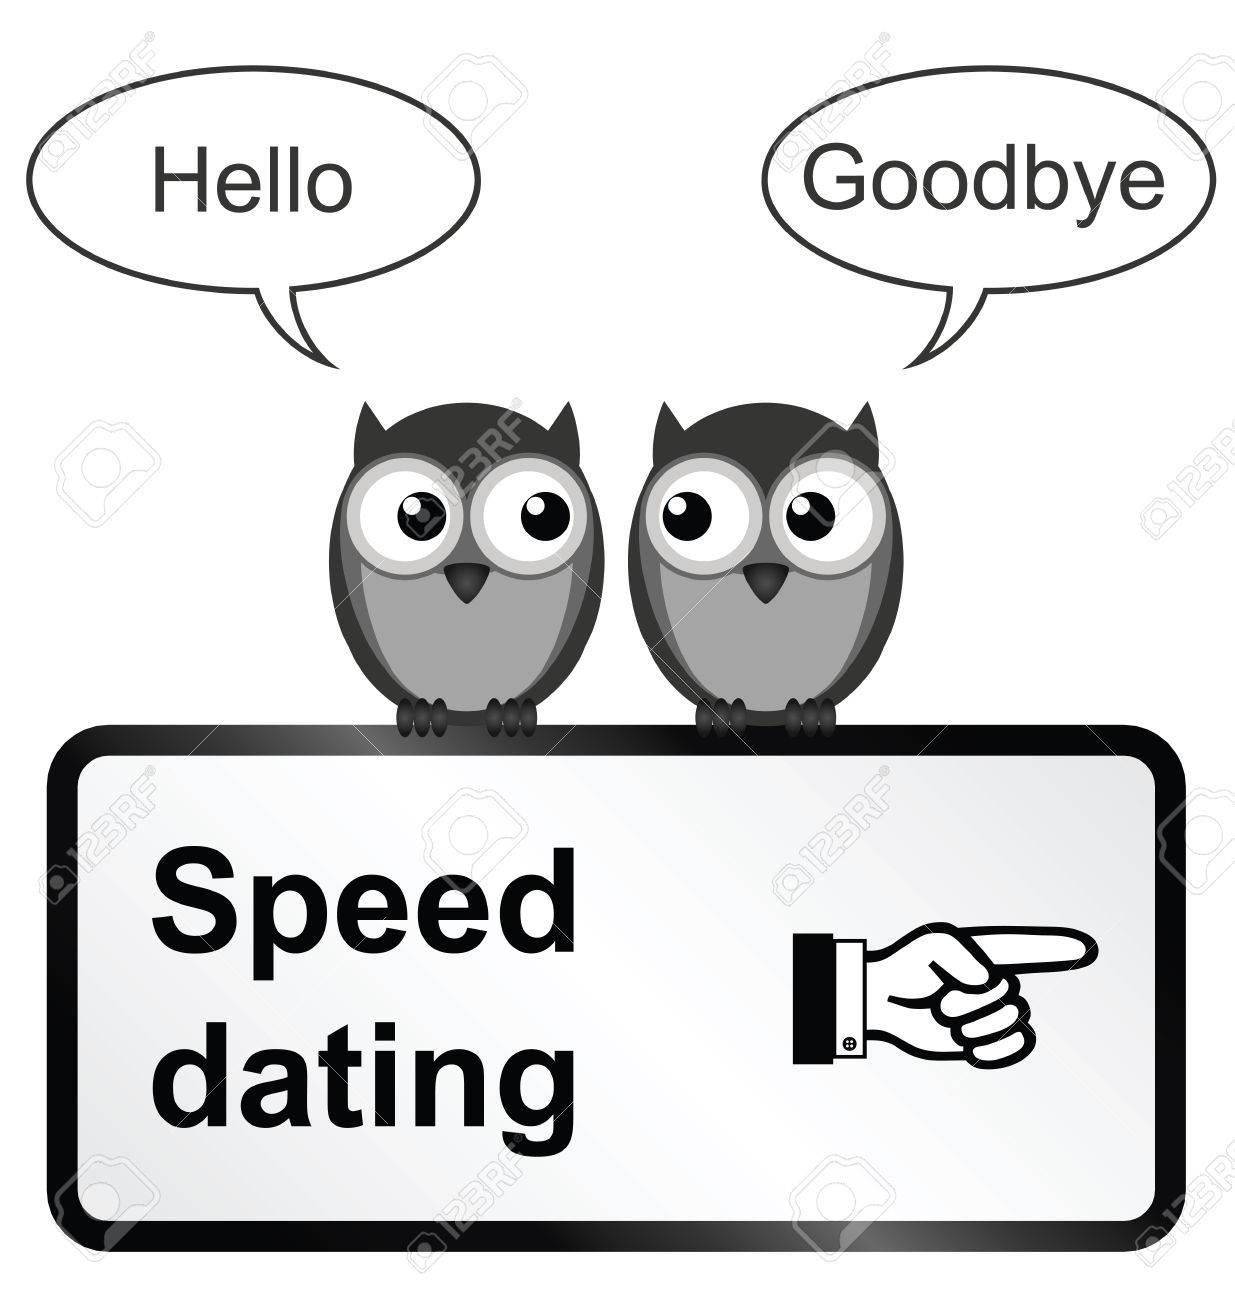 volledig gratis online speed dating